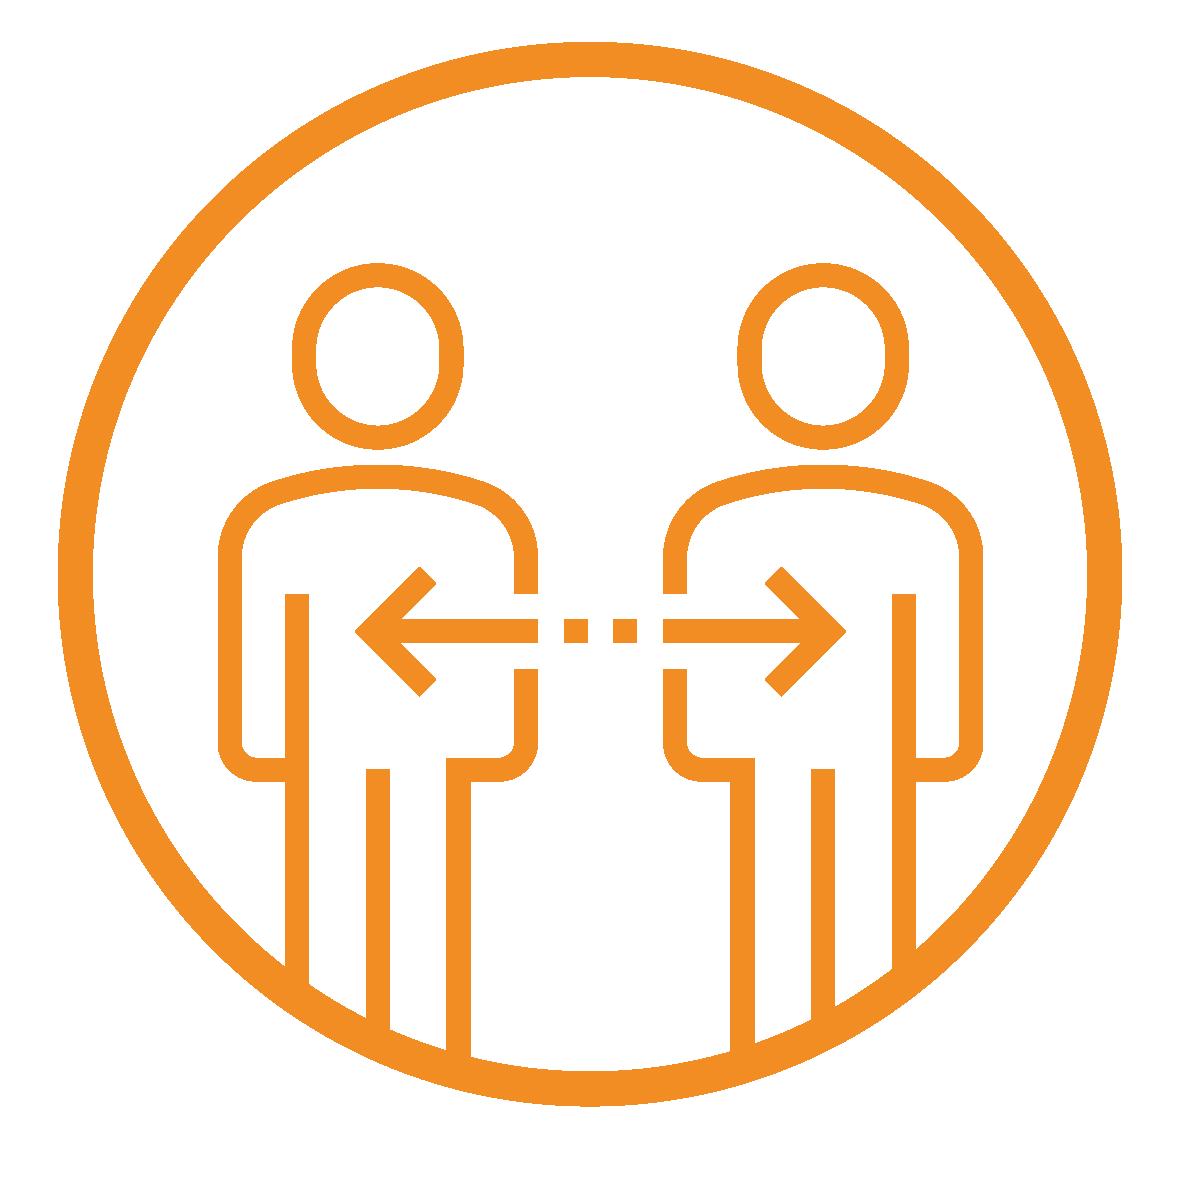 Guidance Orange Icon